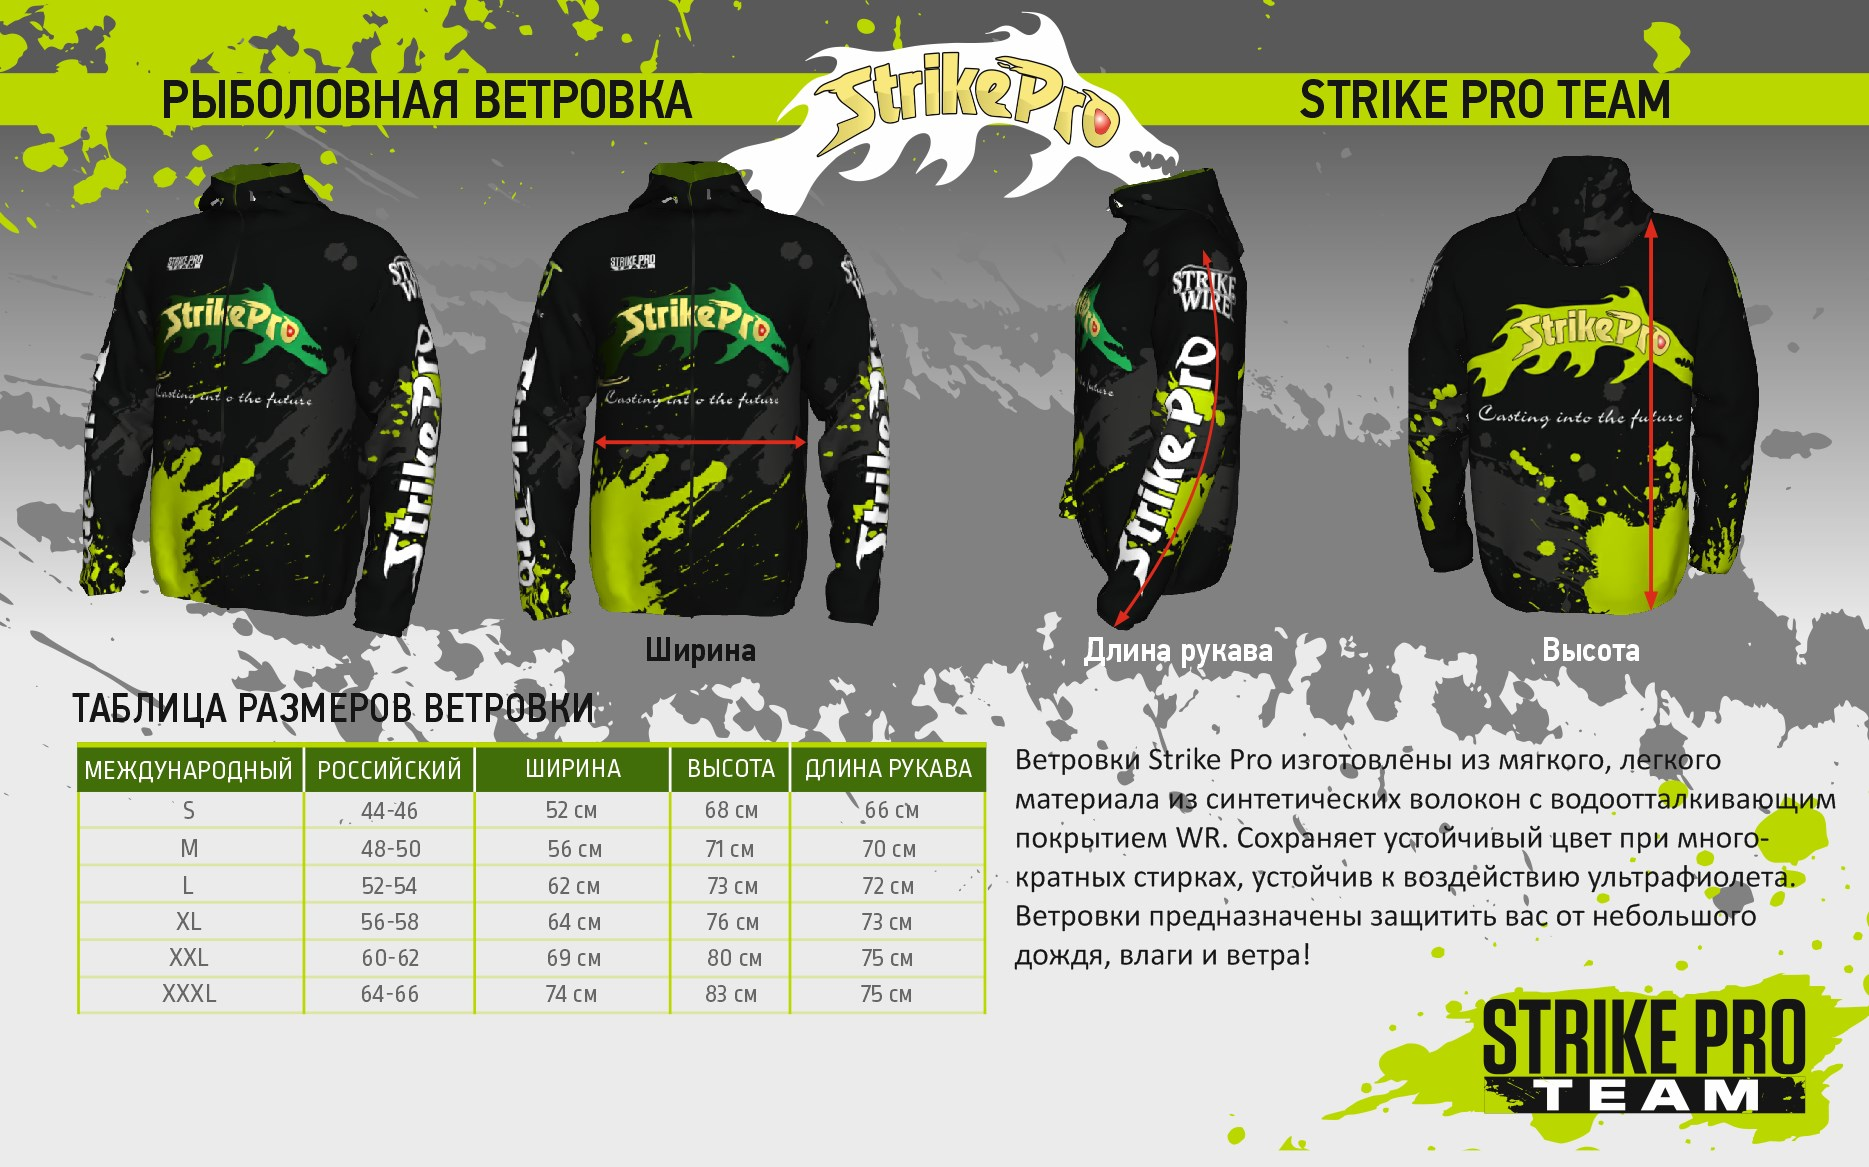 Ветровка Strike Pro